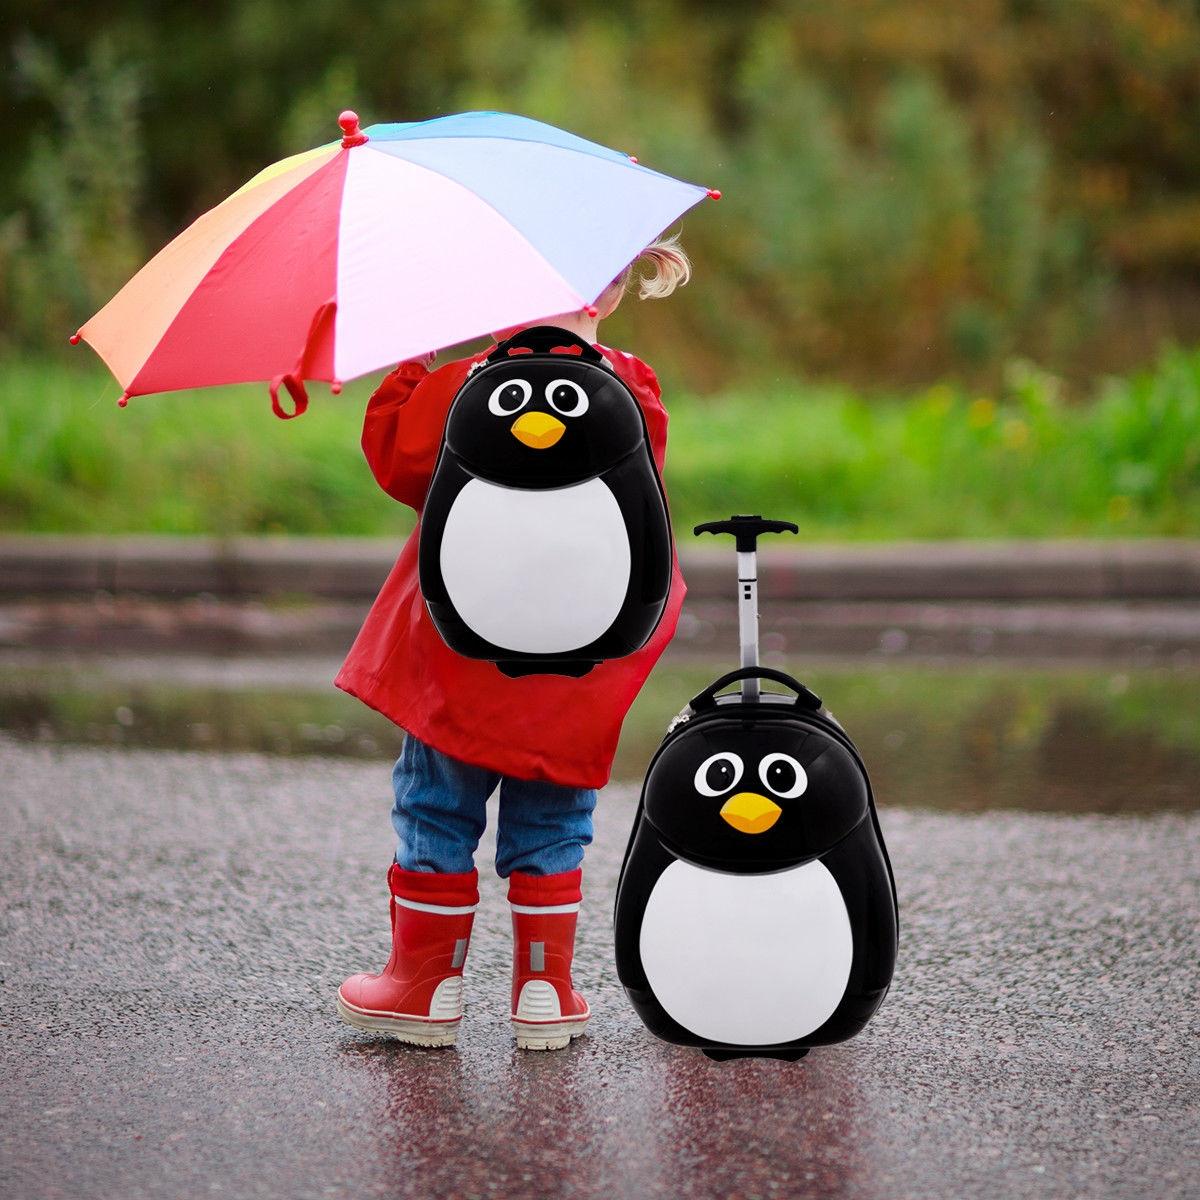 2 pcs Penguin Shaped Kids School Luggage Suitcase & Backpack